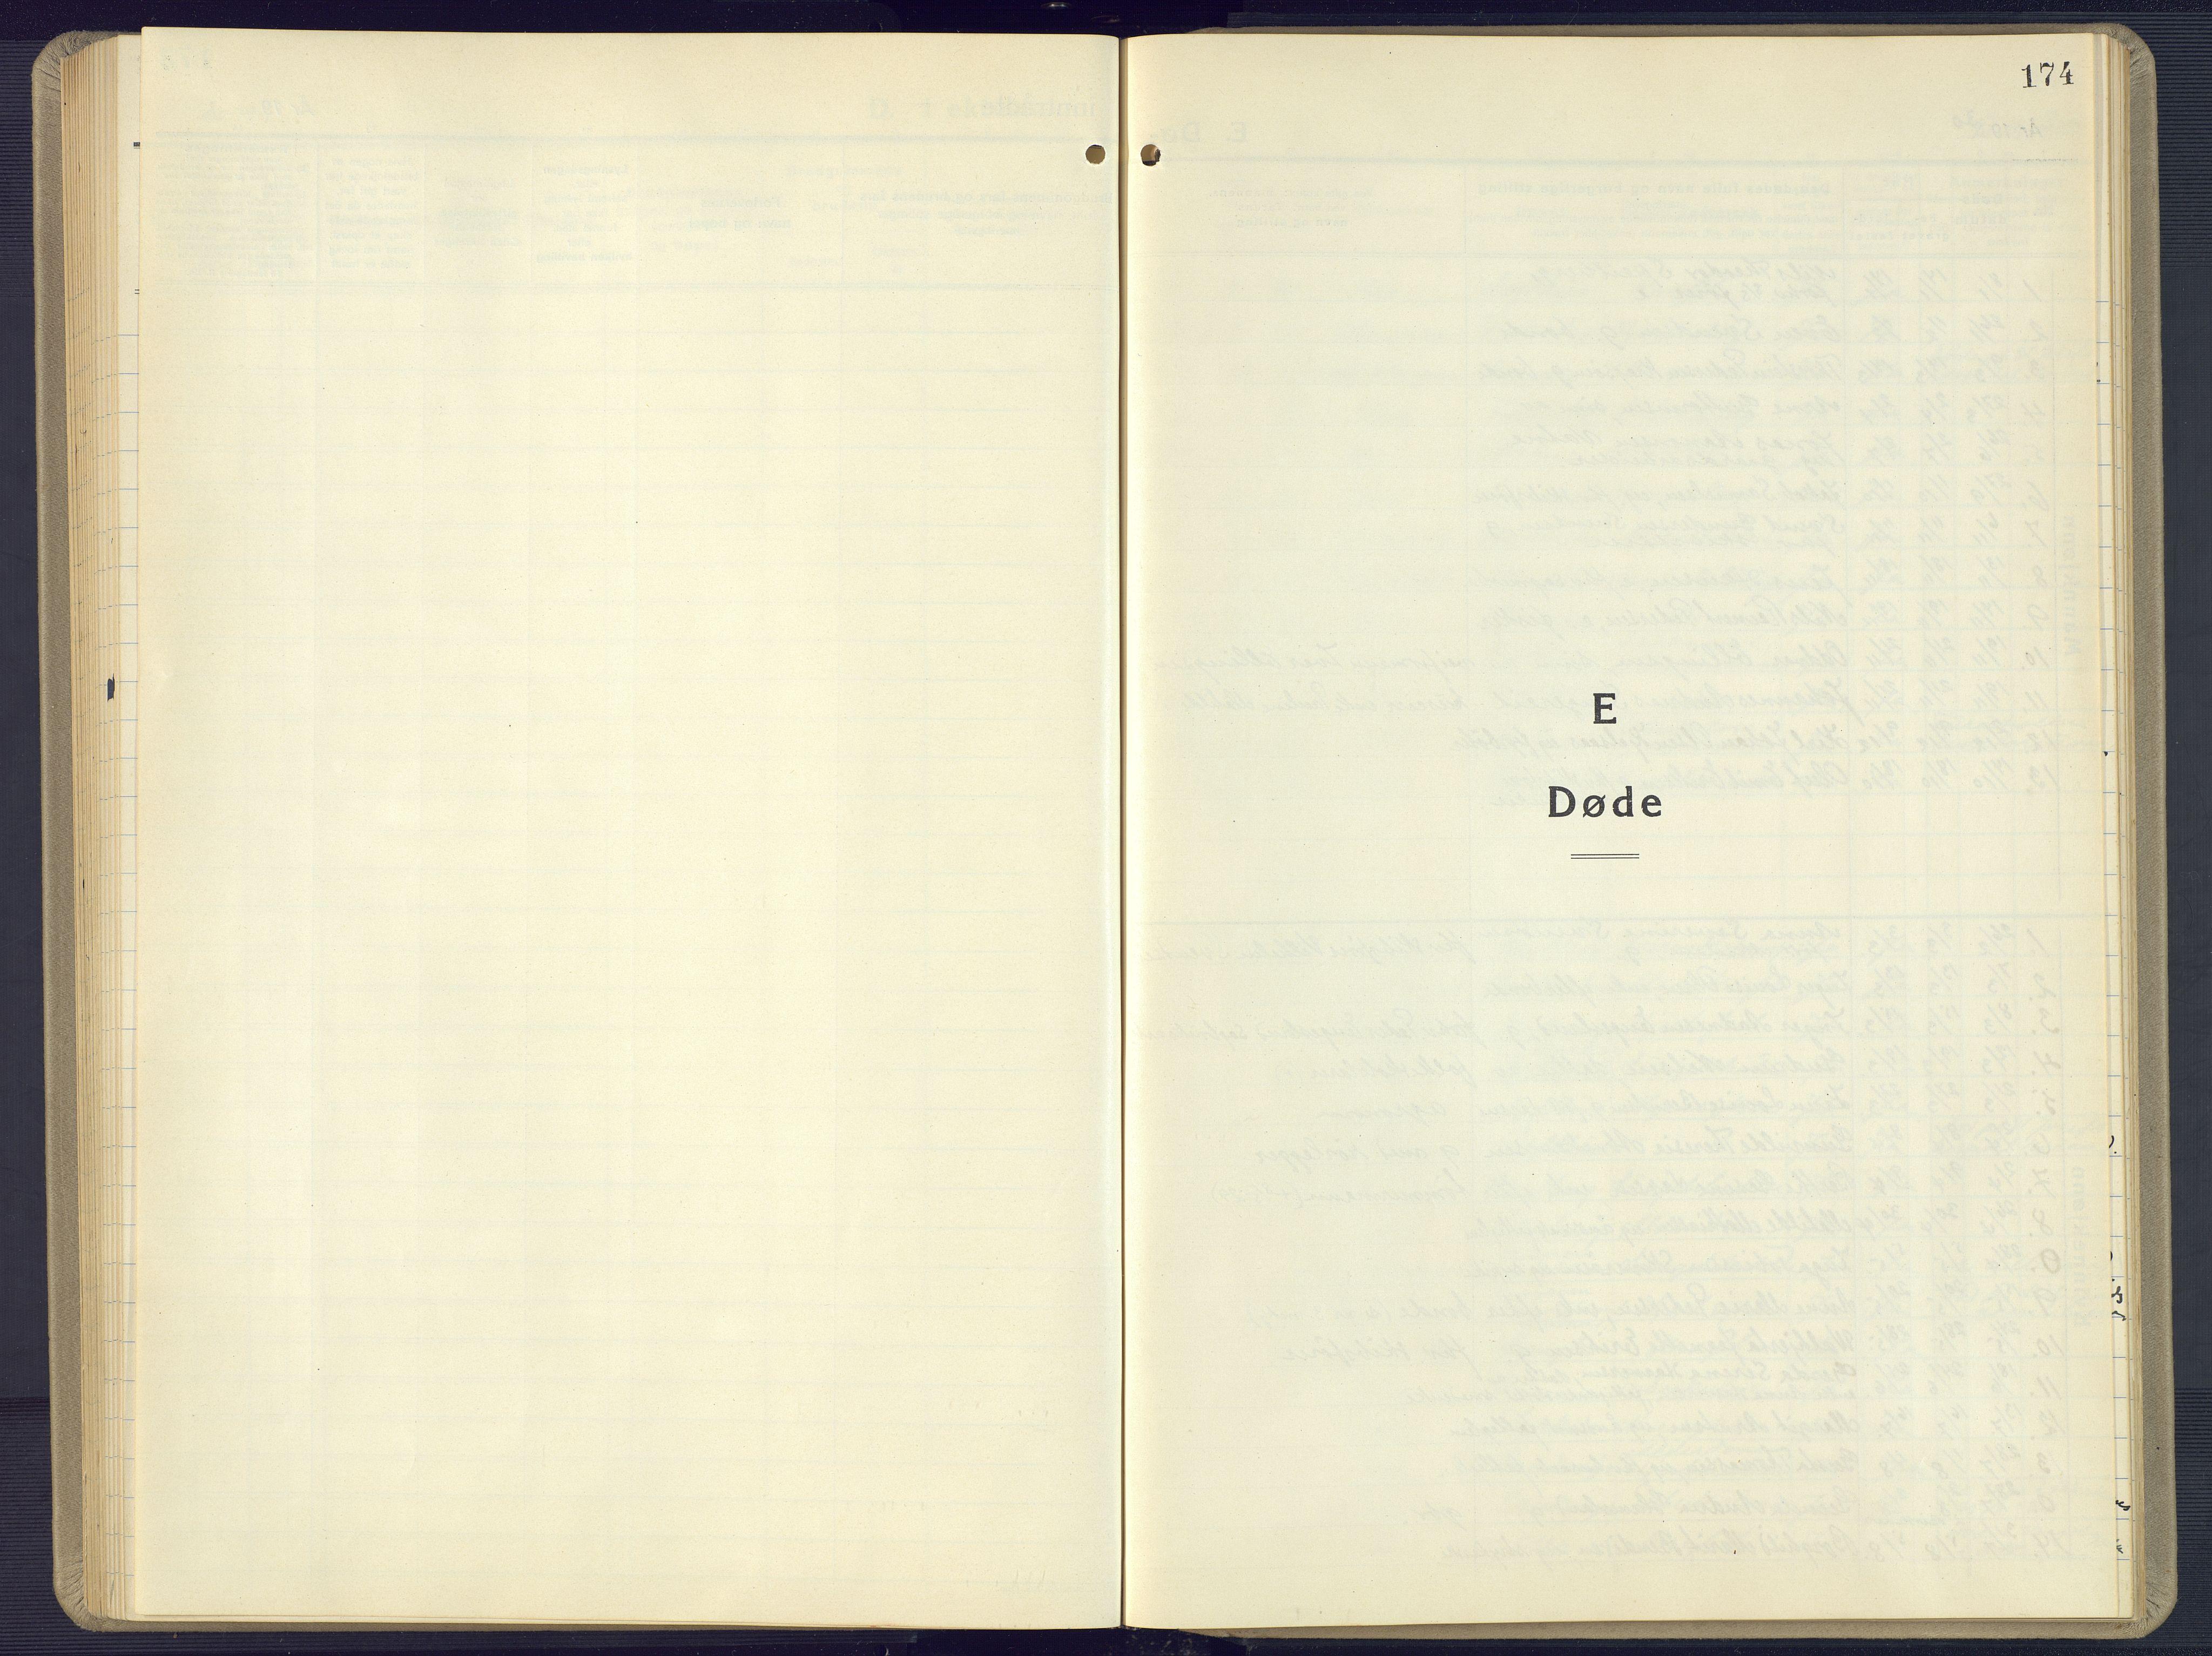 SAK, Vestre Moland sokneprestkontor, F/Fb/Fbb/L0008: Klokkerbok nr. B 8, 1930-1966, s. 174